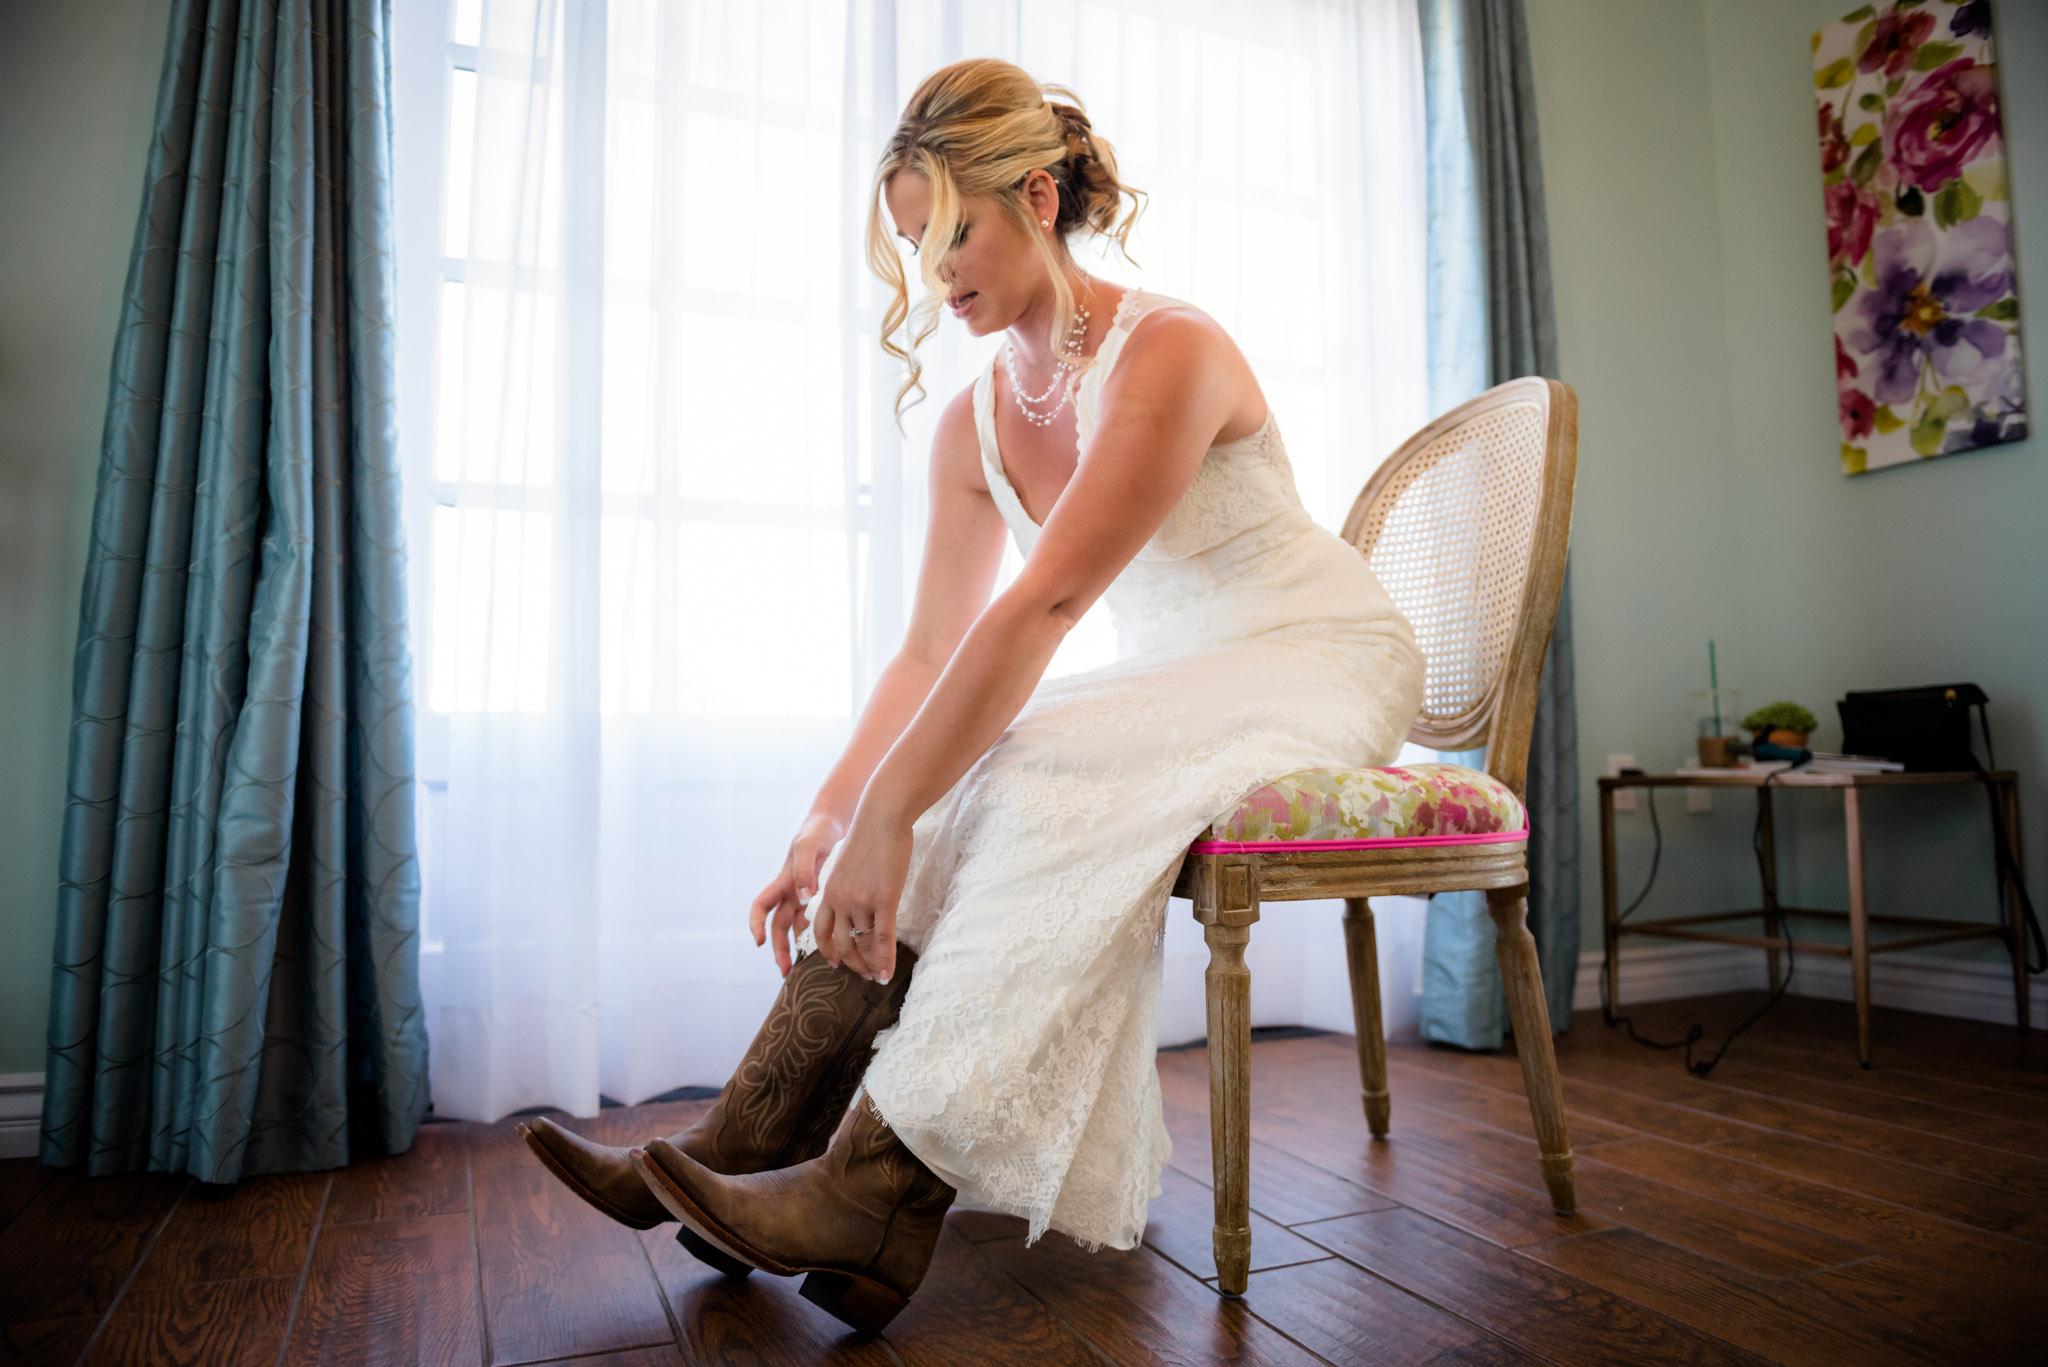 Avensole-Winery-Temecula-Wedding-Josh-and-Olivia-3112.JPG